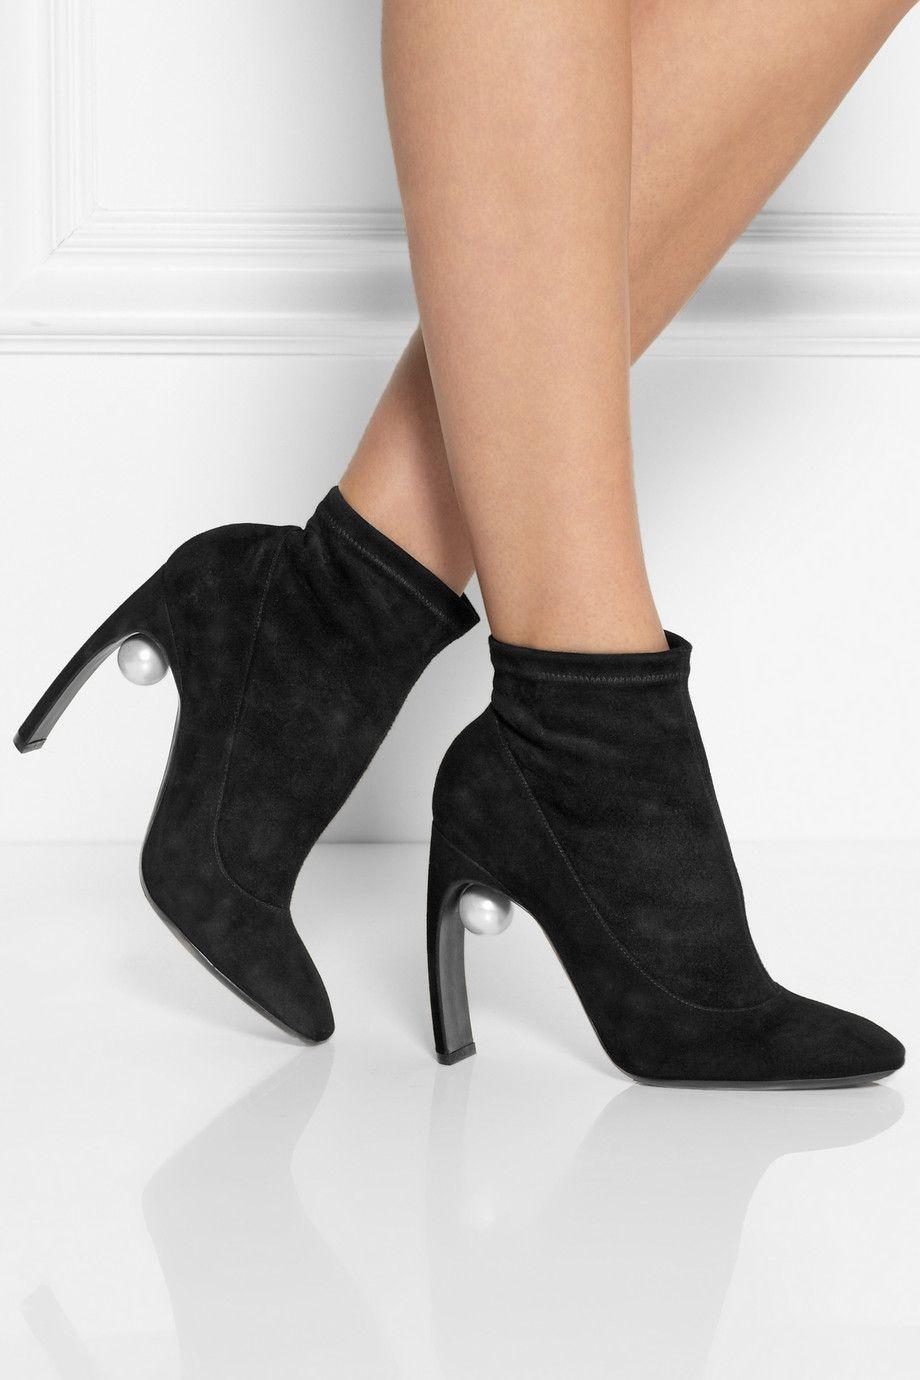 Nicholas Kirkwood|Embellished stretch-suede ankle boots|NET-A-PORTER.COM